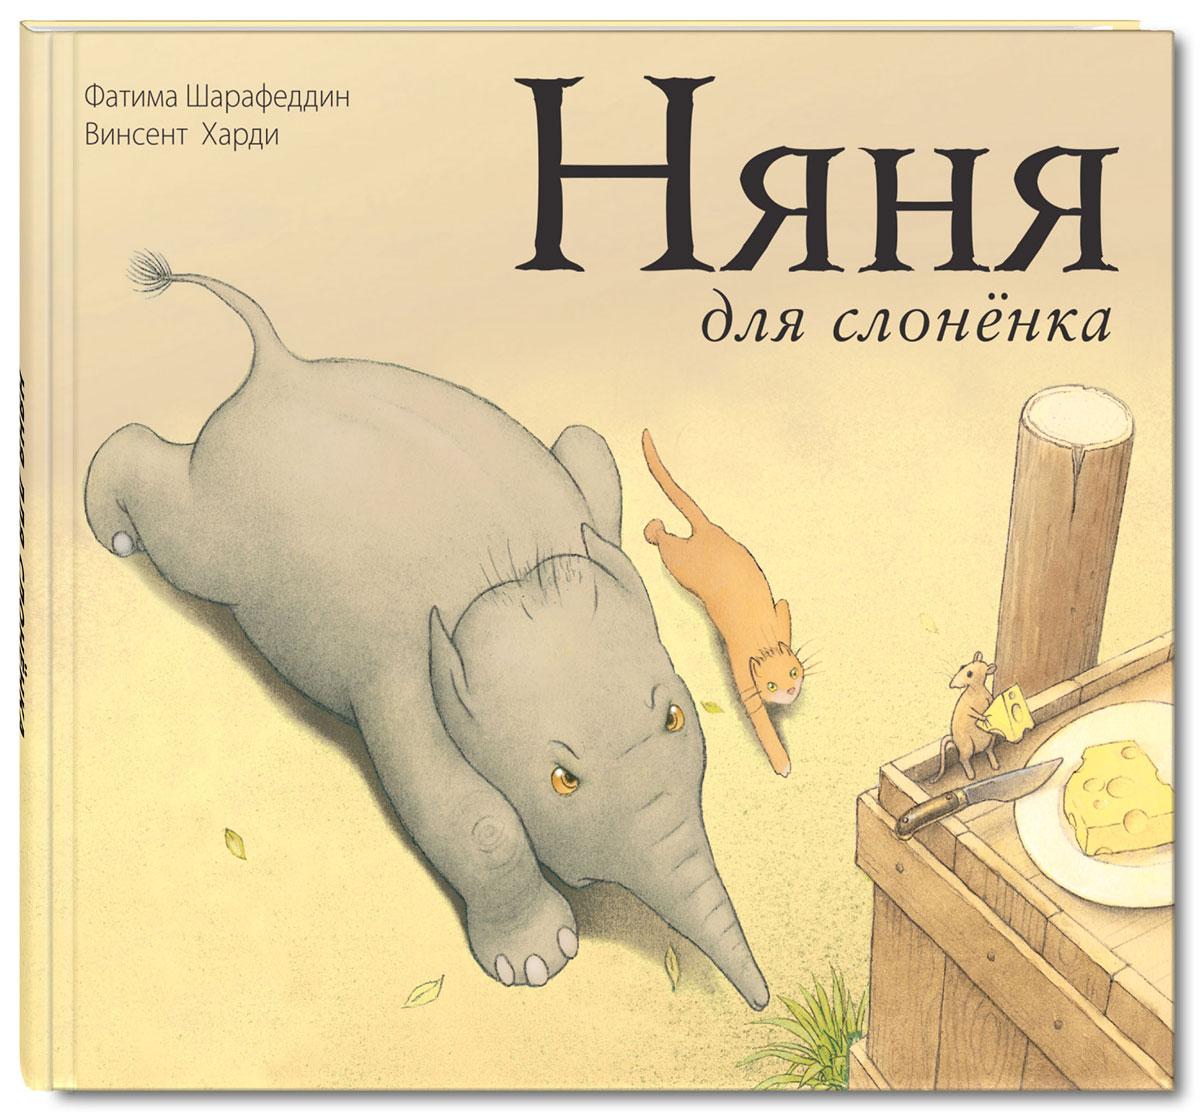 Фото Фатима Шарафеддин Няня для слоненка. Купить  в РФ